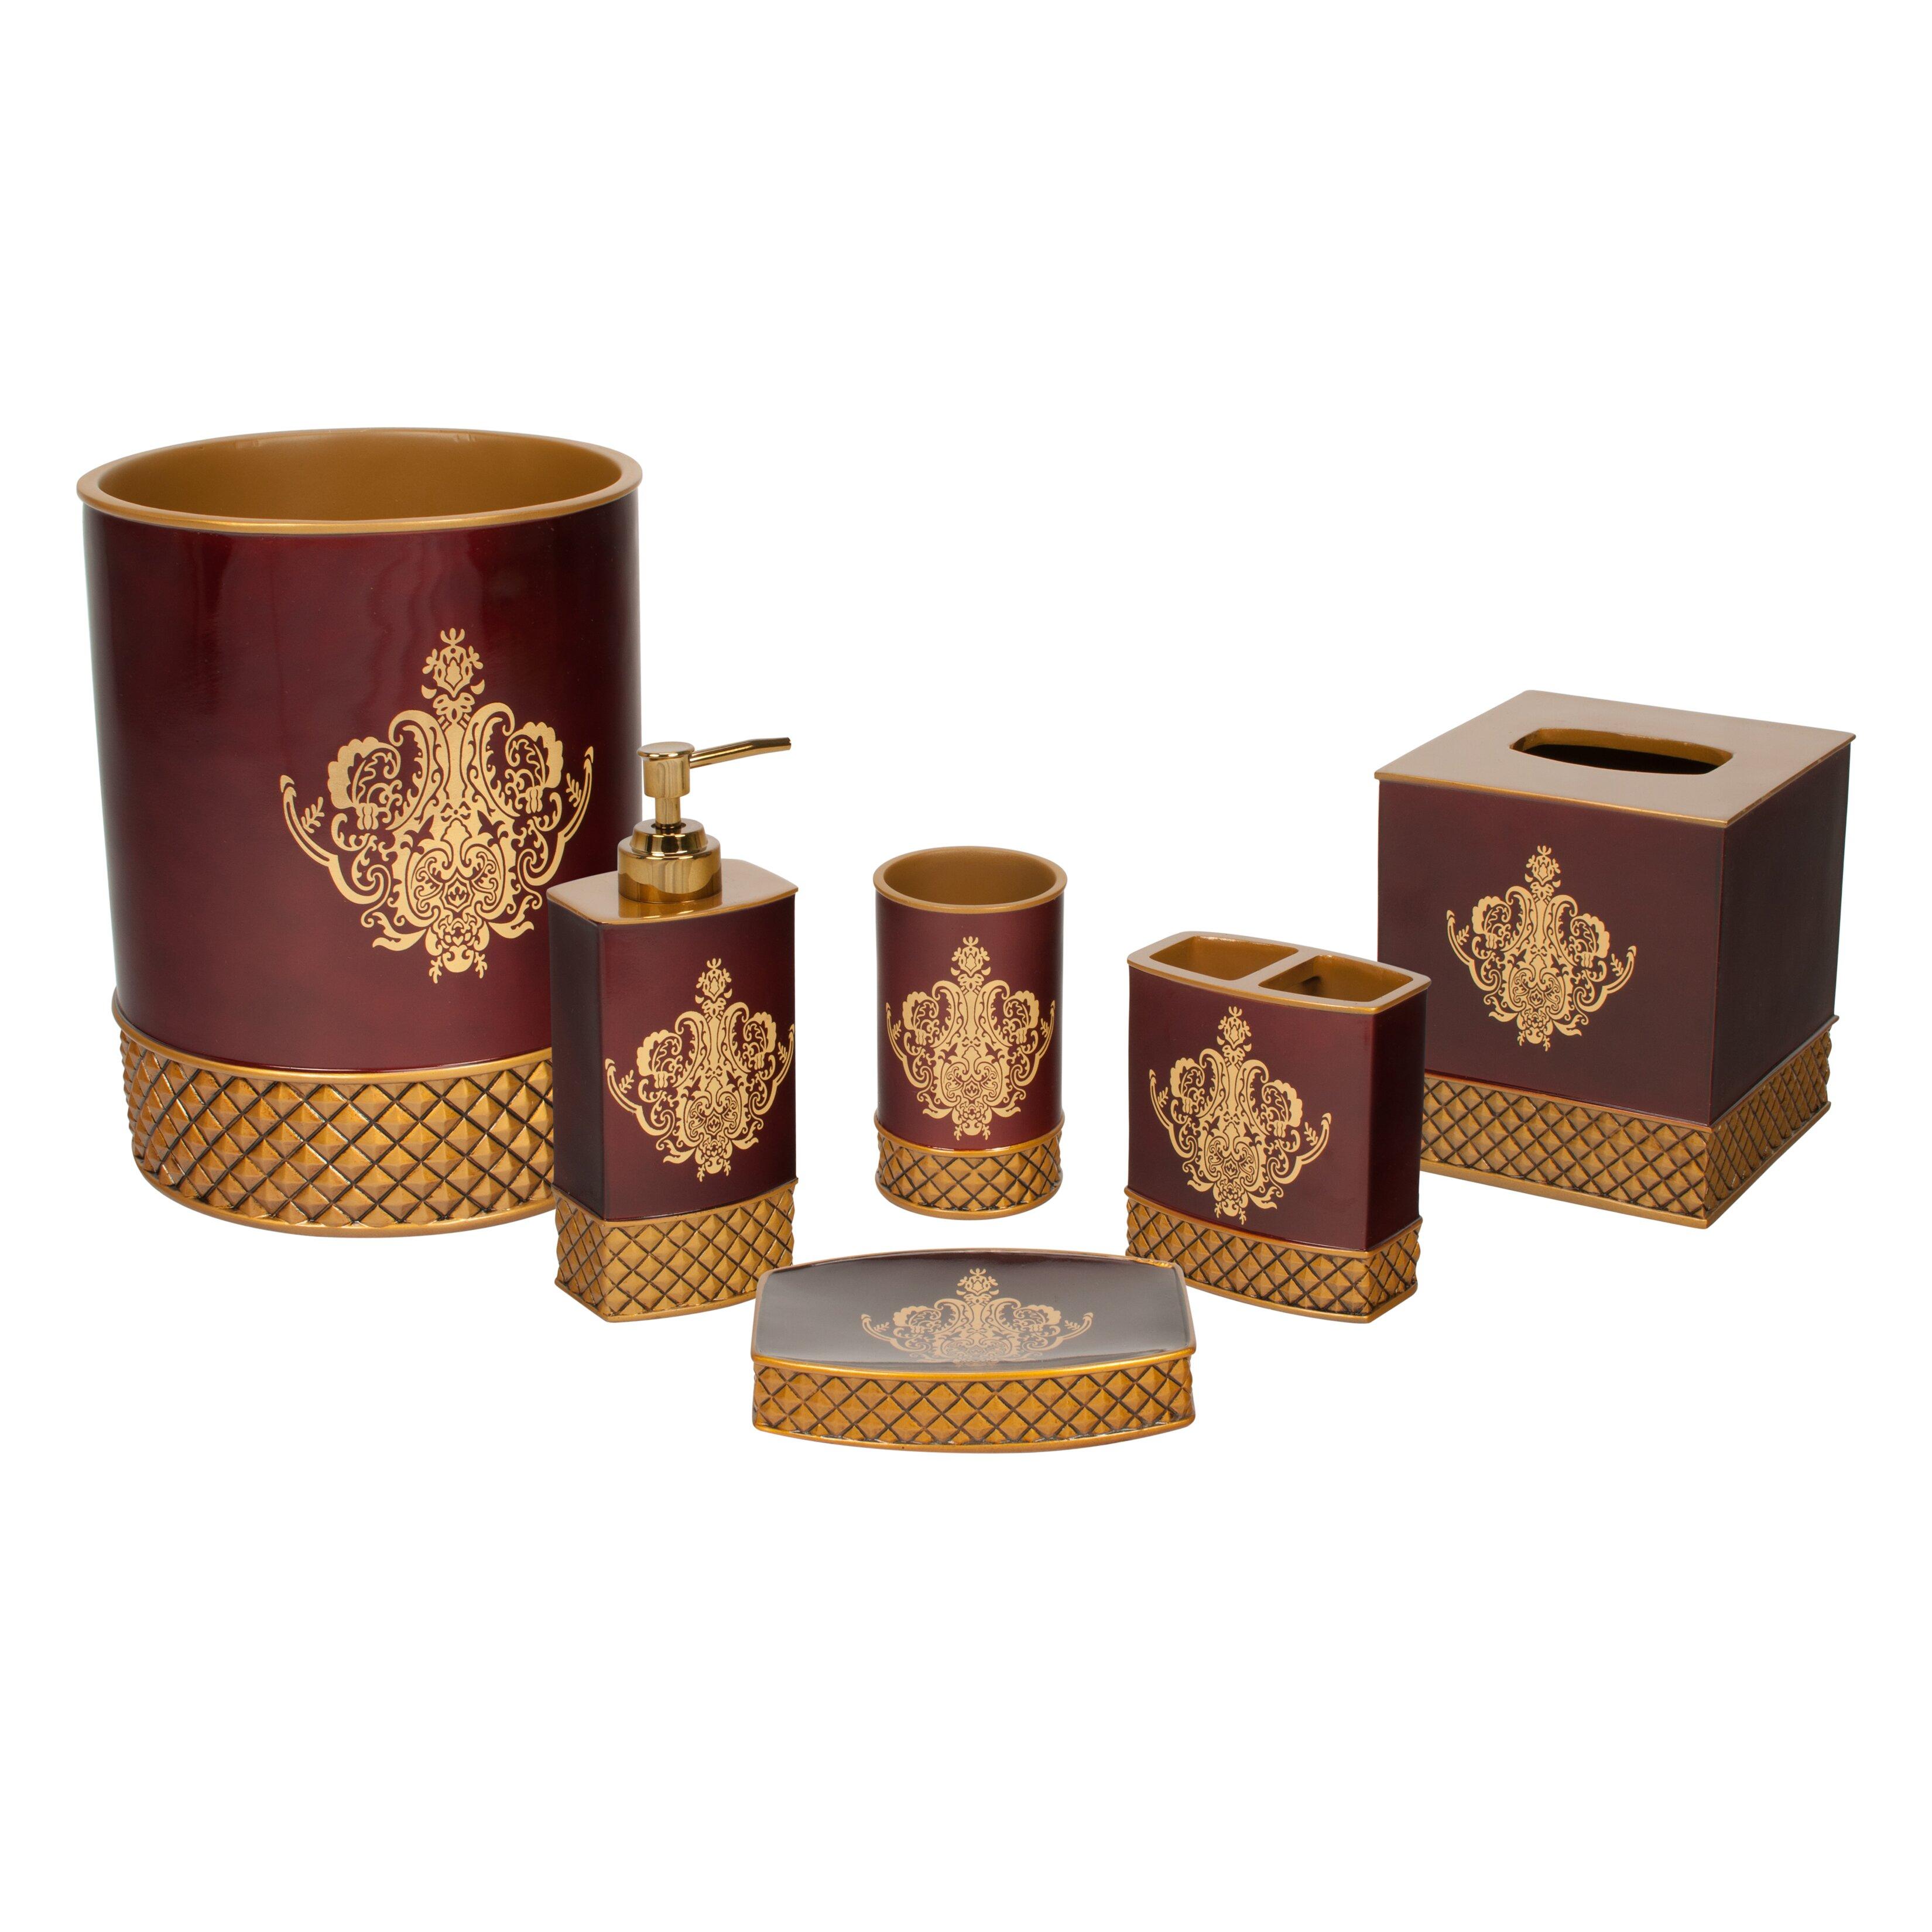 Austin horn classics china art 6 piece bath accessory set for Bathroom accessory kit